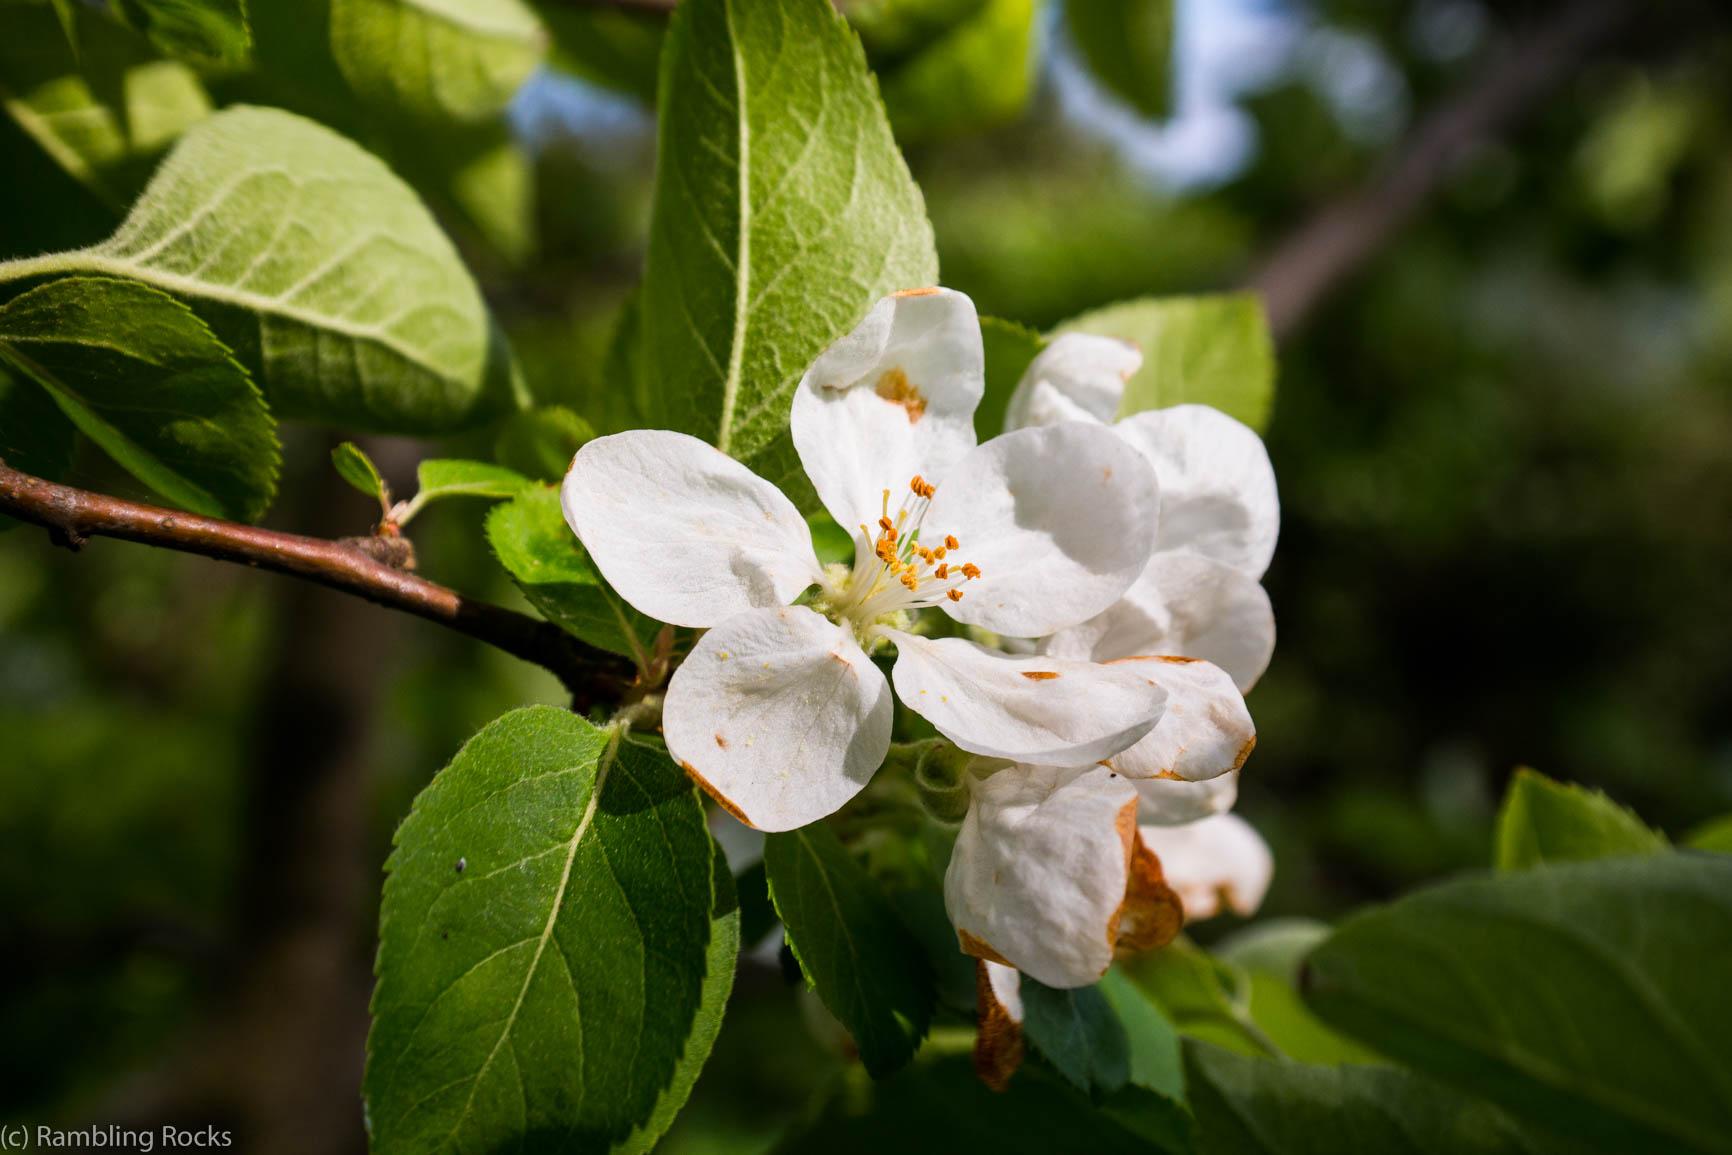 Apfelblüte Phänologie